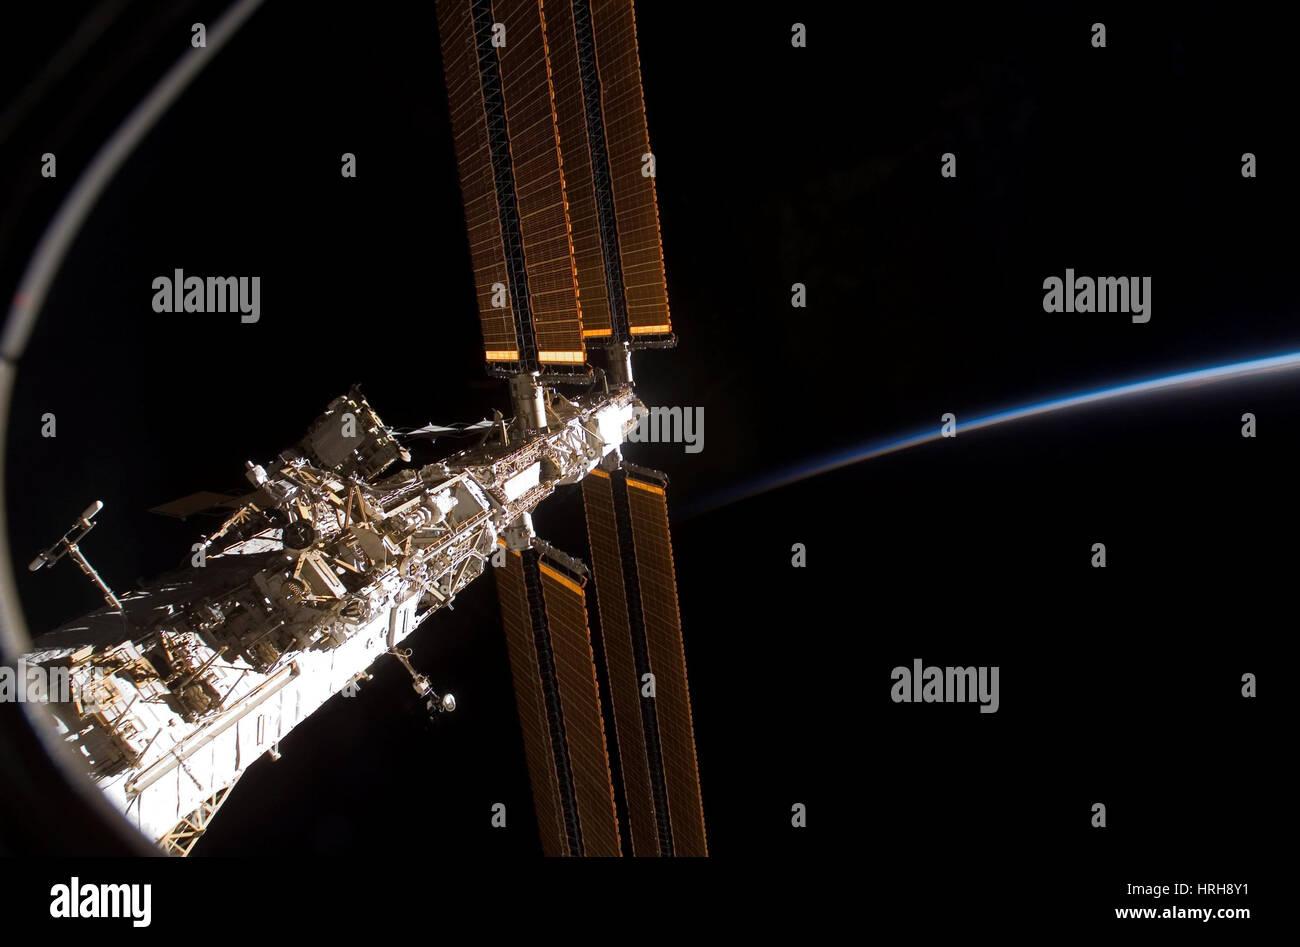 STS-122, internationale Raumstation, 2008 Stockbild